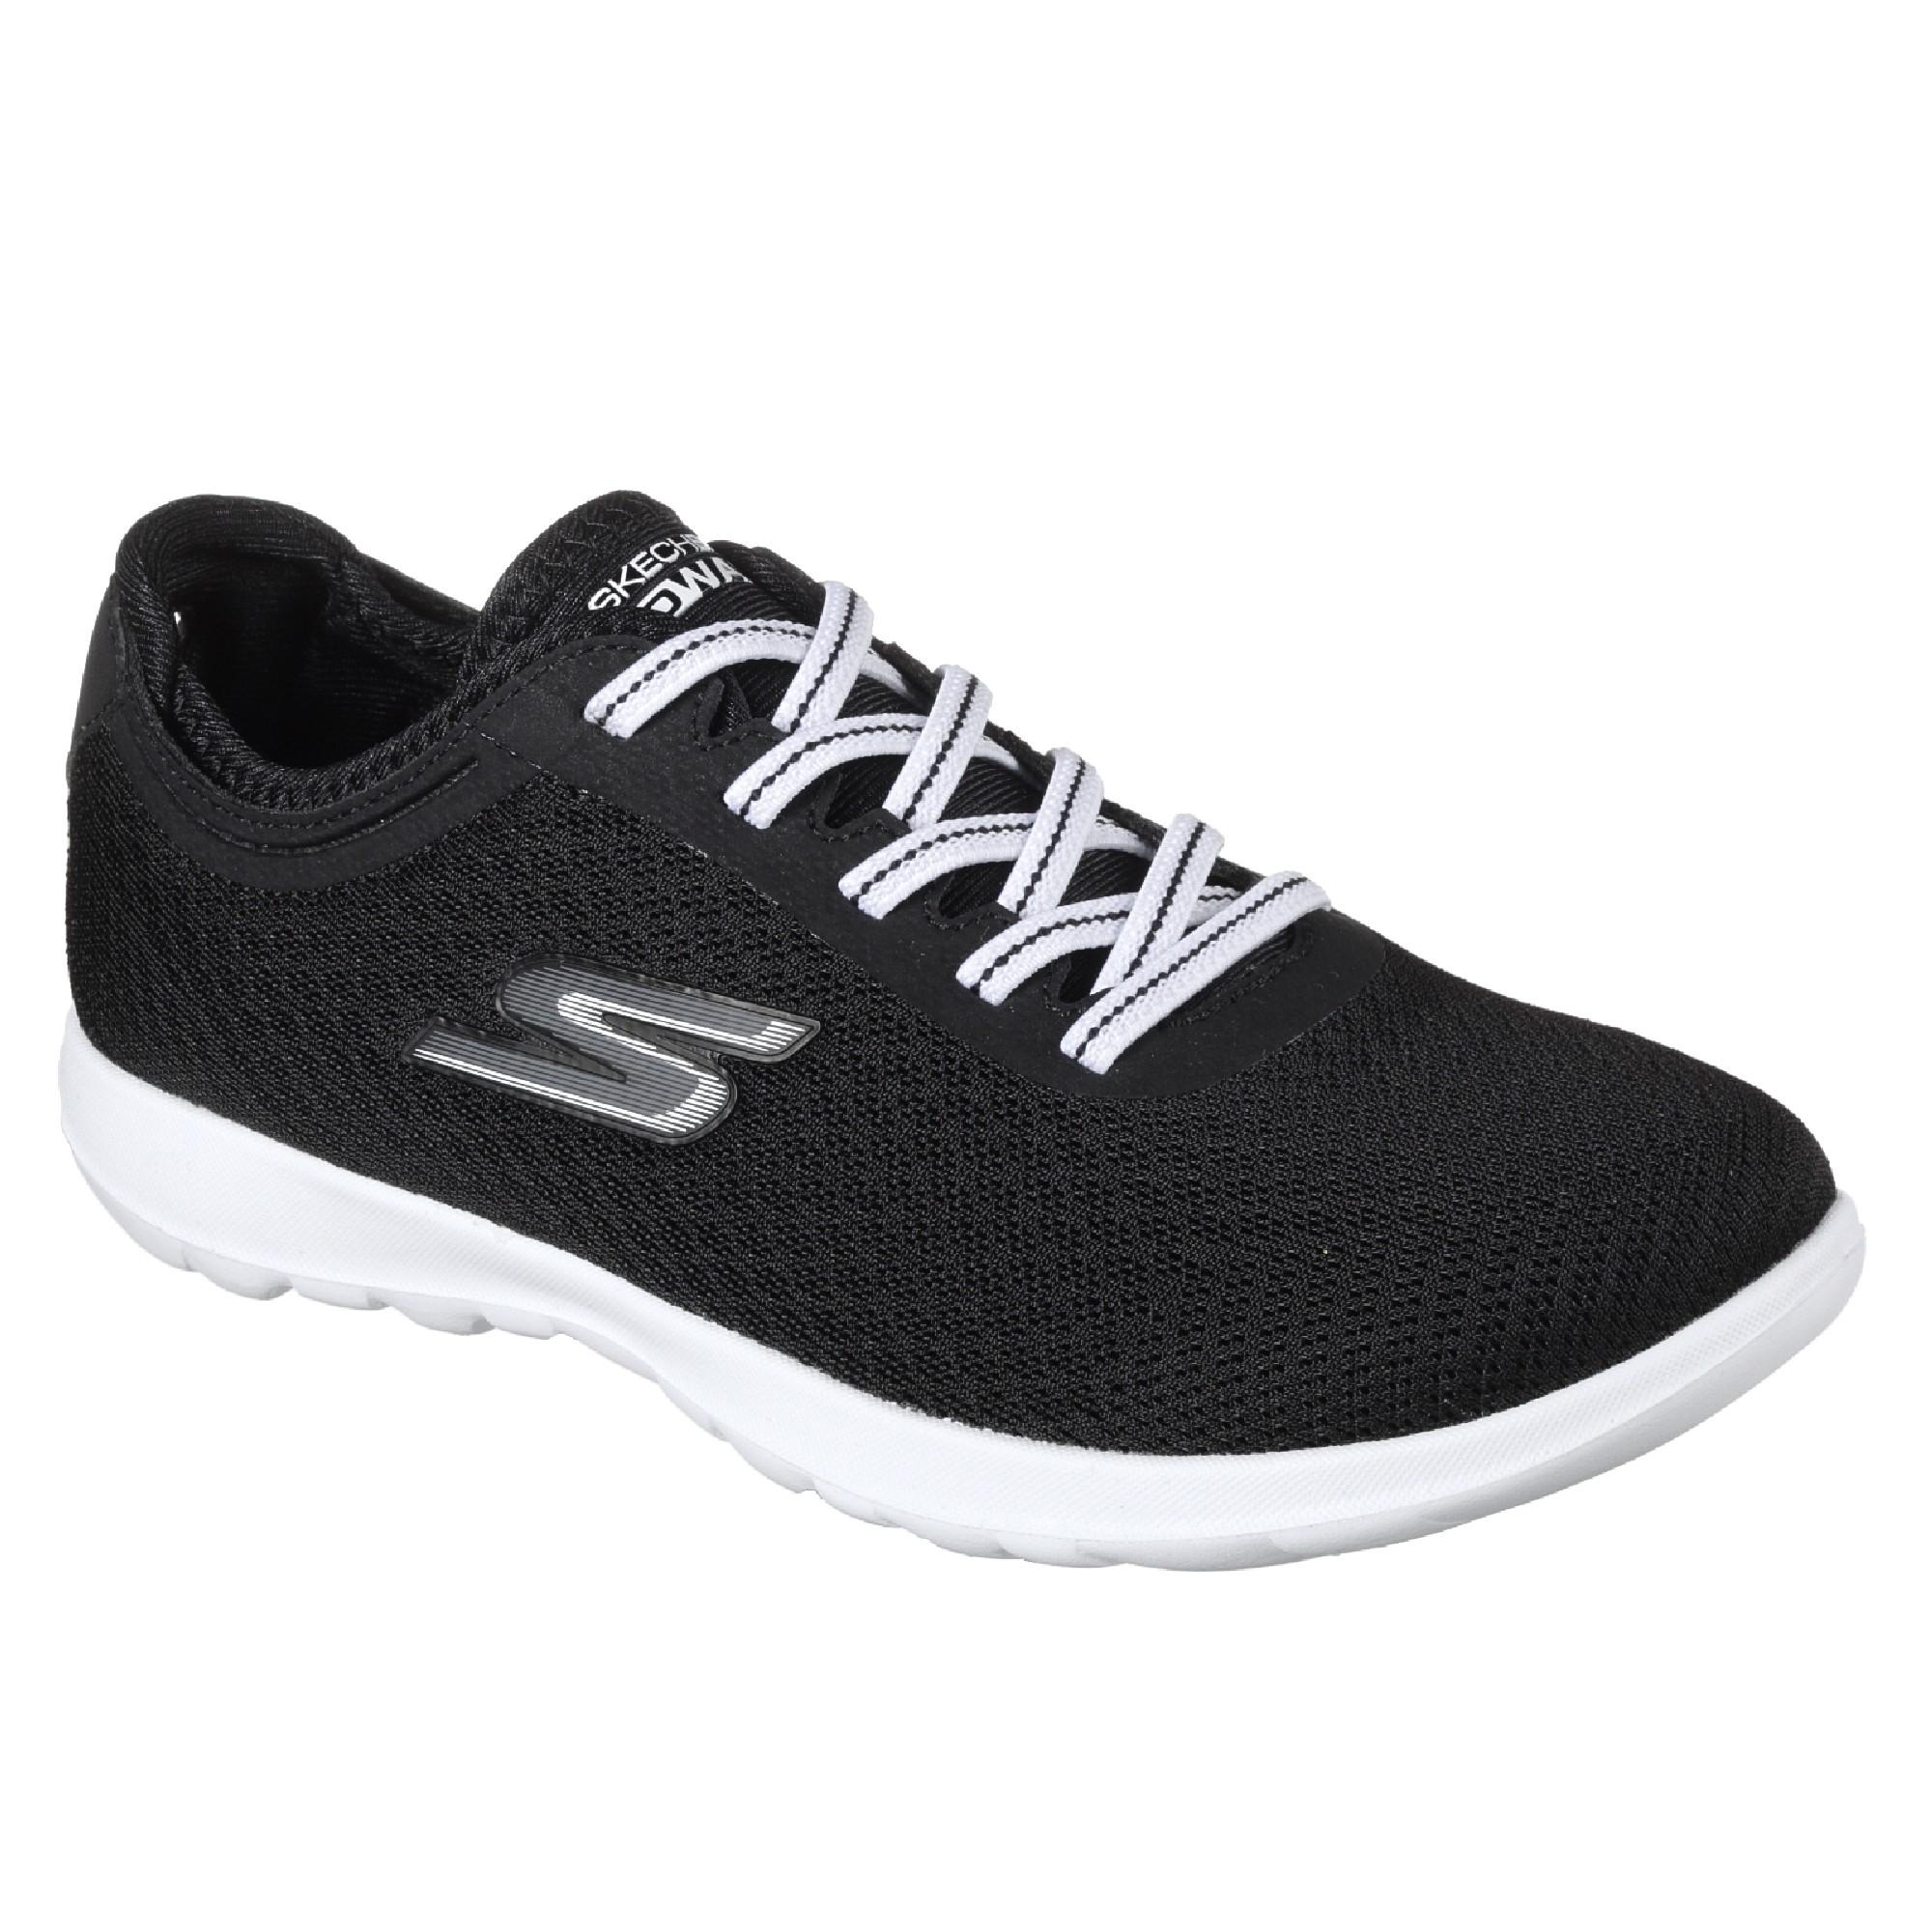 Go Walk Lite-Impulse, Zapatillas para Mujer, Negro (Black/White), 38 EU Skechers